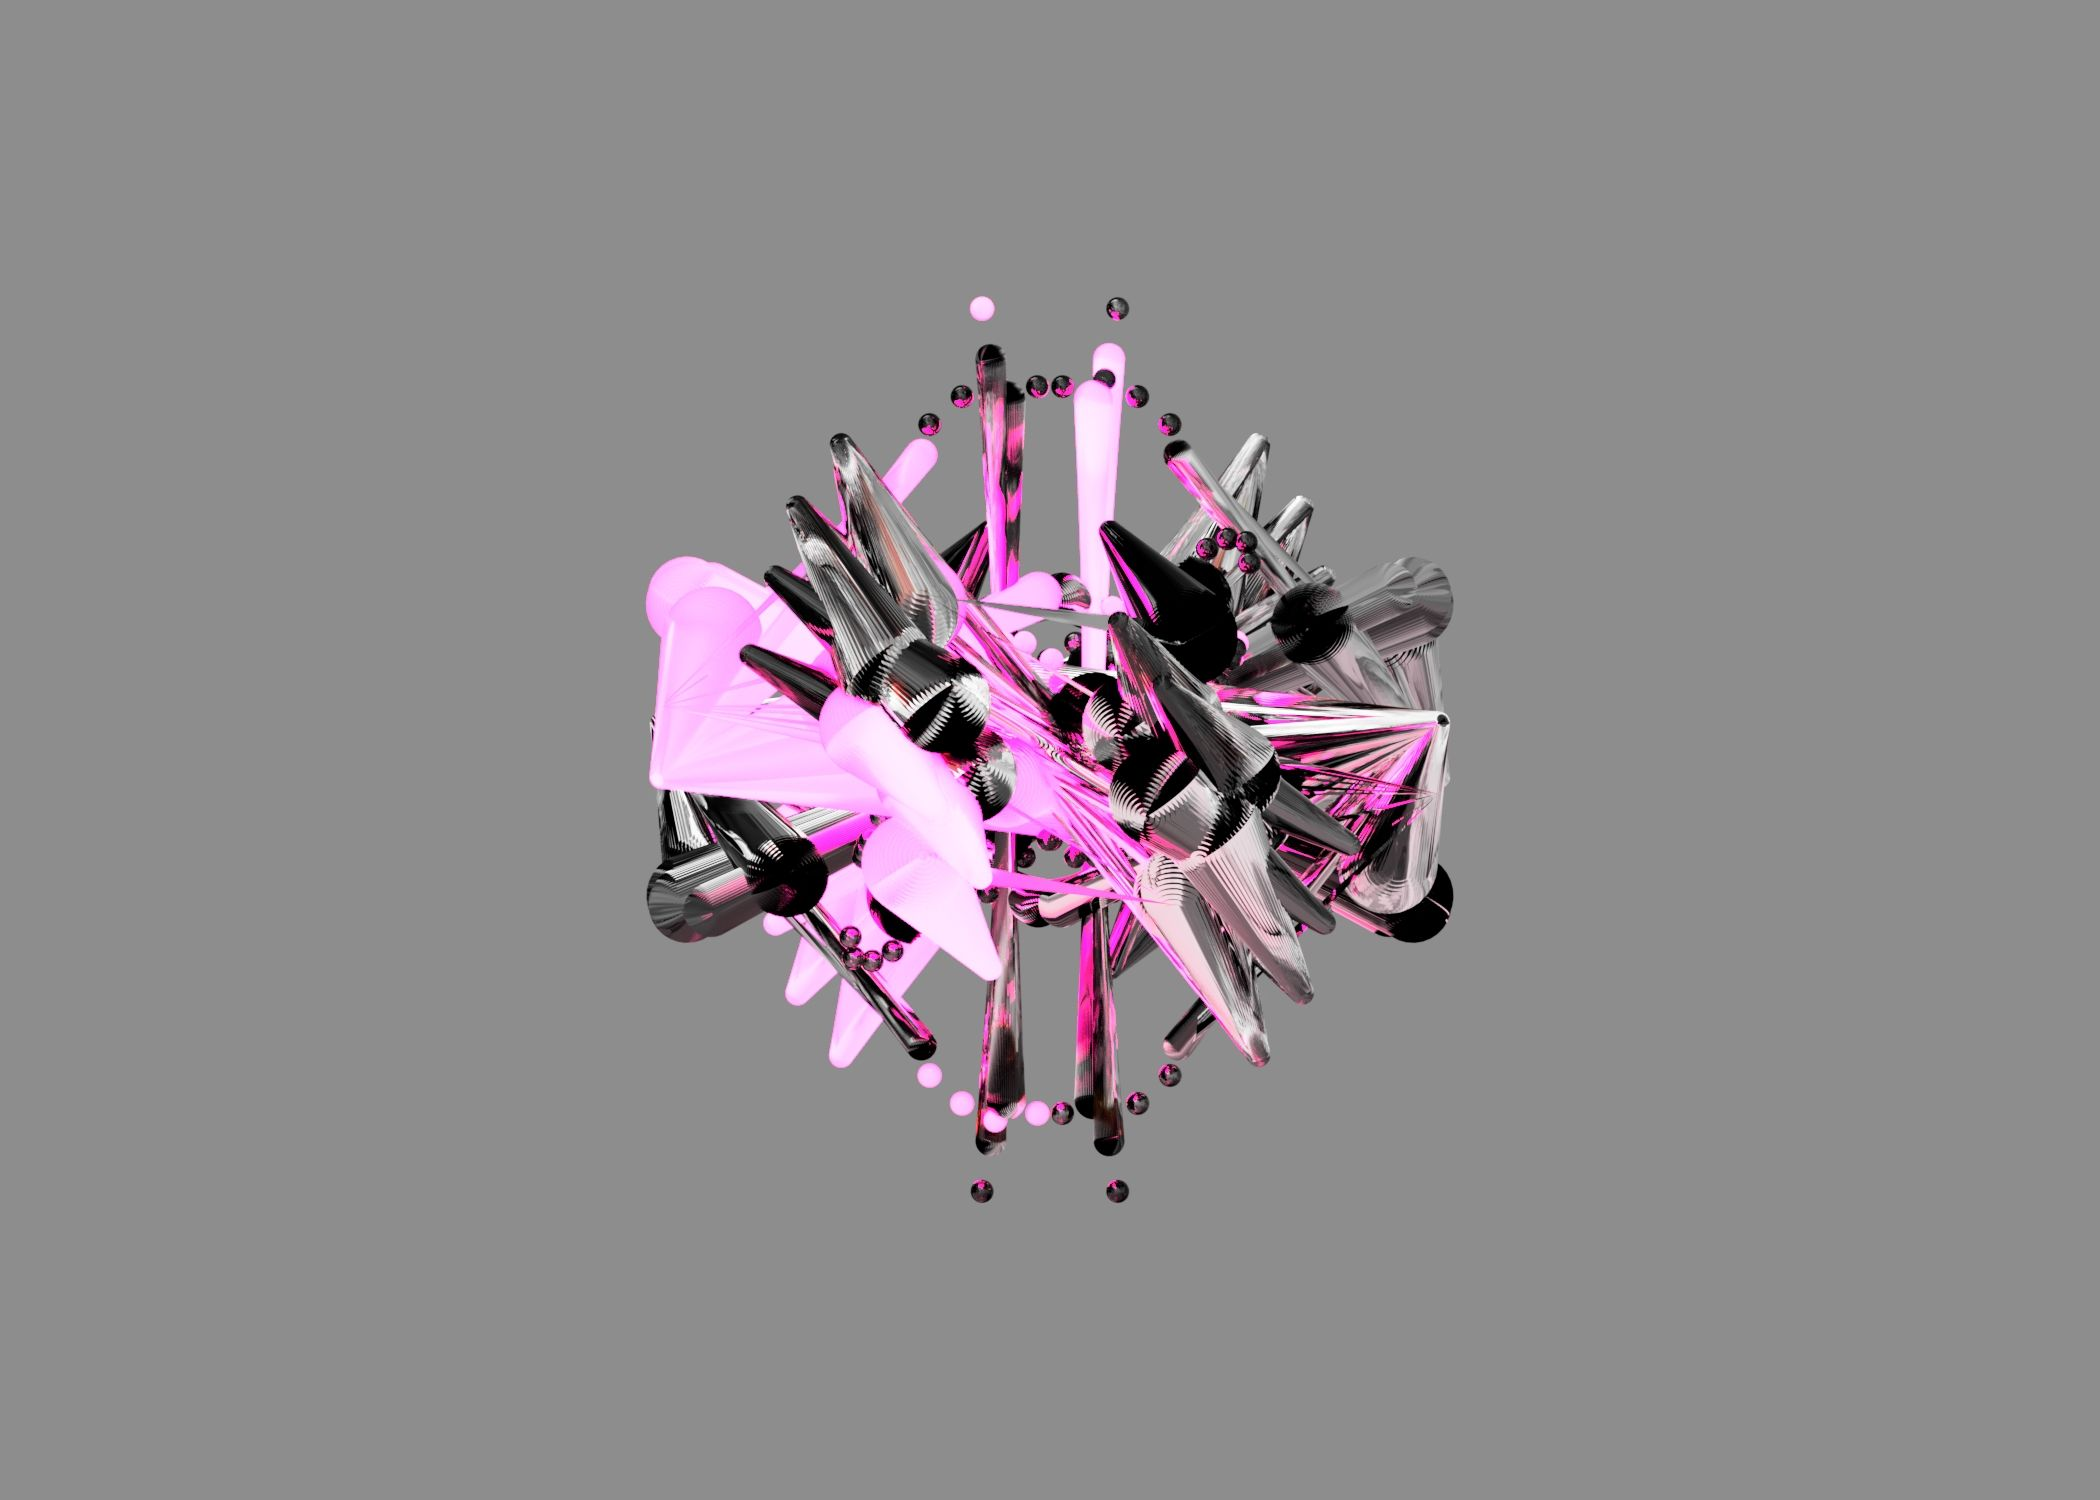 Raasrendering-53410d5f-e58a-467c-b726-5e2cadb09434-3500-3500